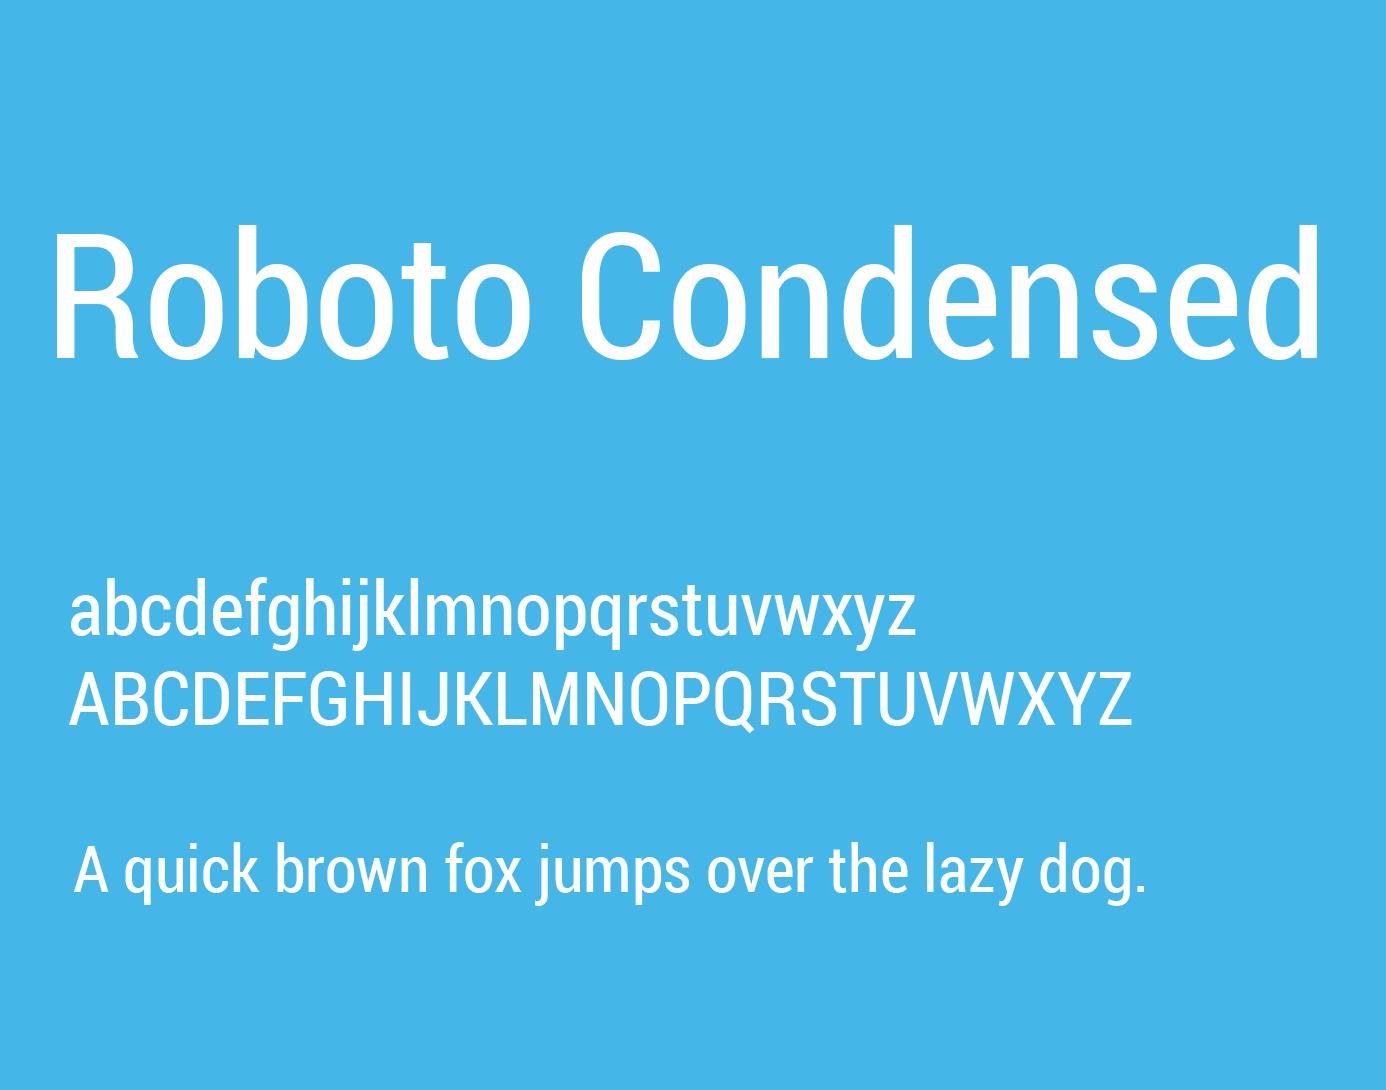 roboto-condensed-font